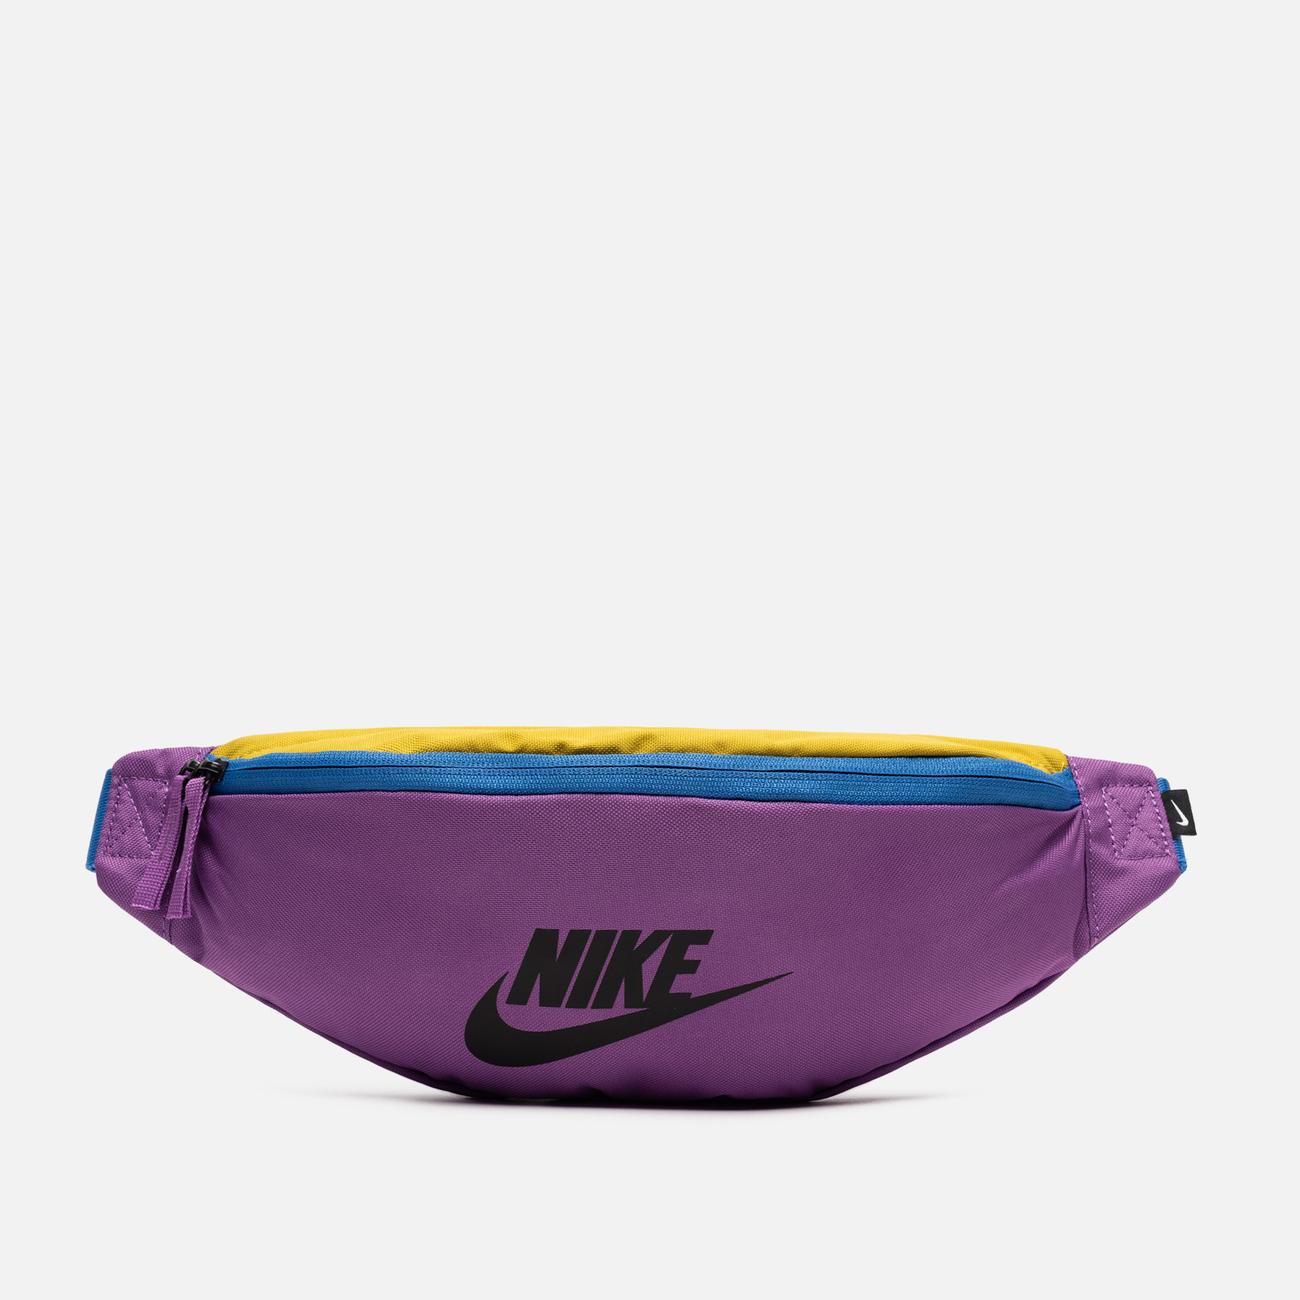 Сумка на пояс Nike Heritage Purple Nebula/Pacific Blue/Black